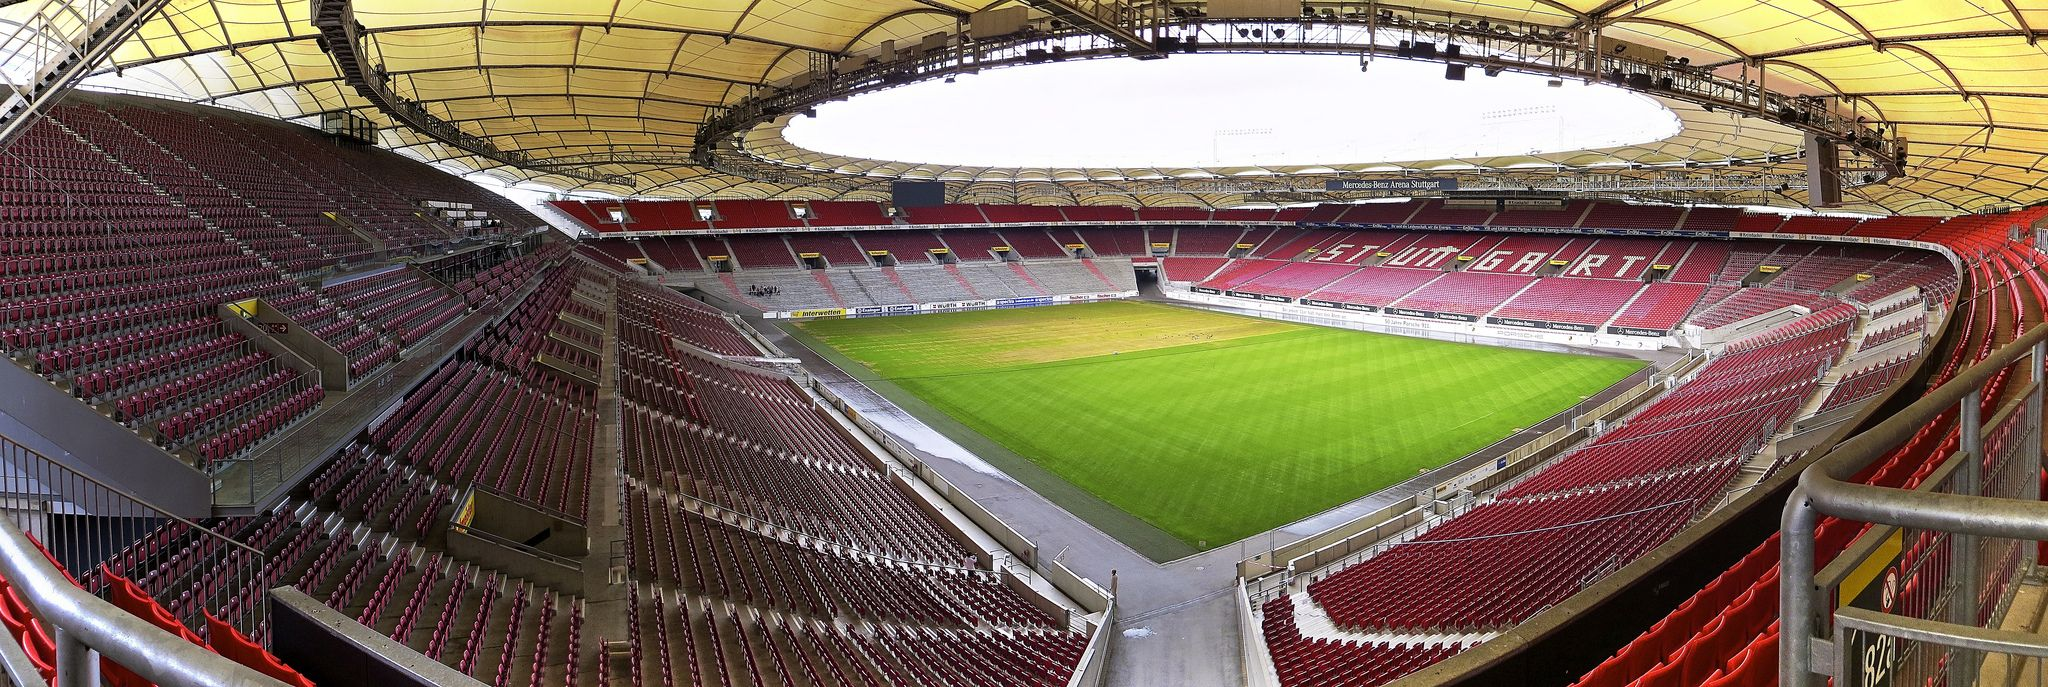 Vfb Stuttgart Vs Atletico Madrid 05082018 Football Ticket Net